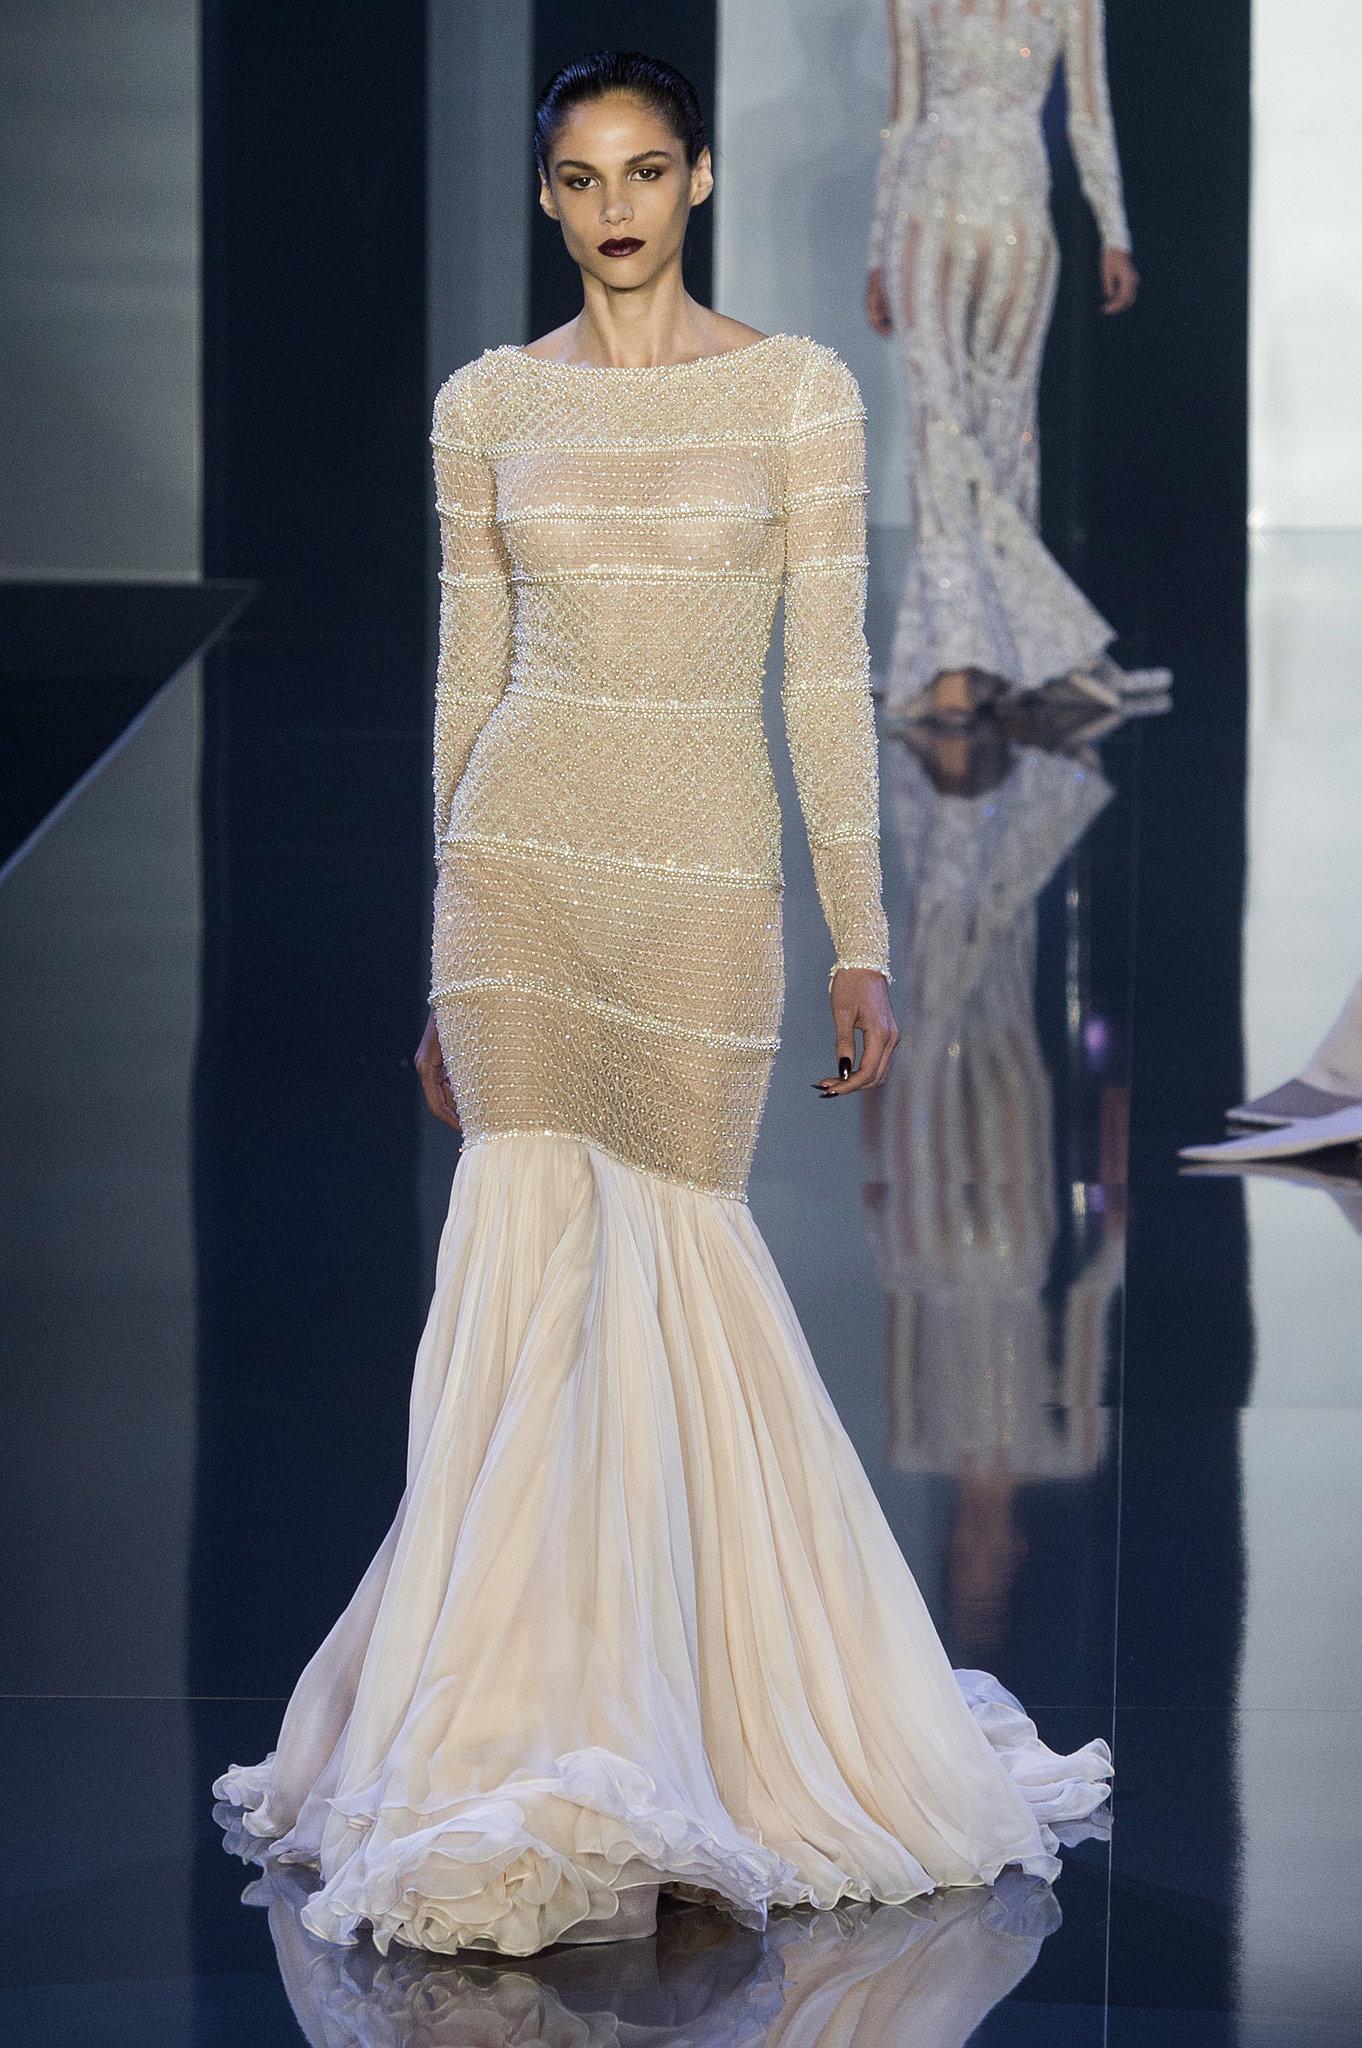 Ralph russo haute couture fall 2014 the prettiest for Loving haute couture